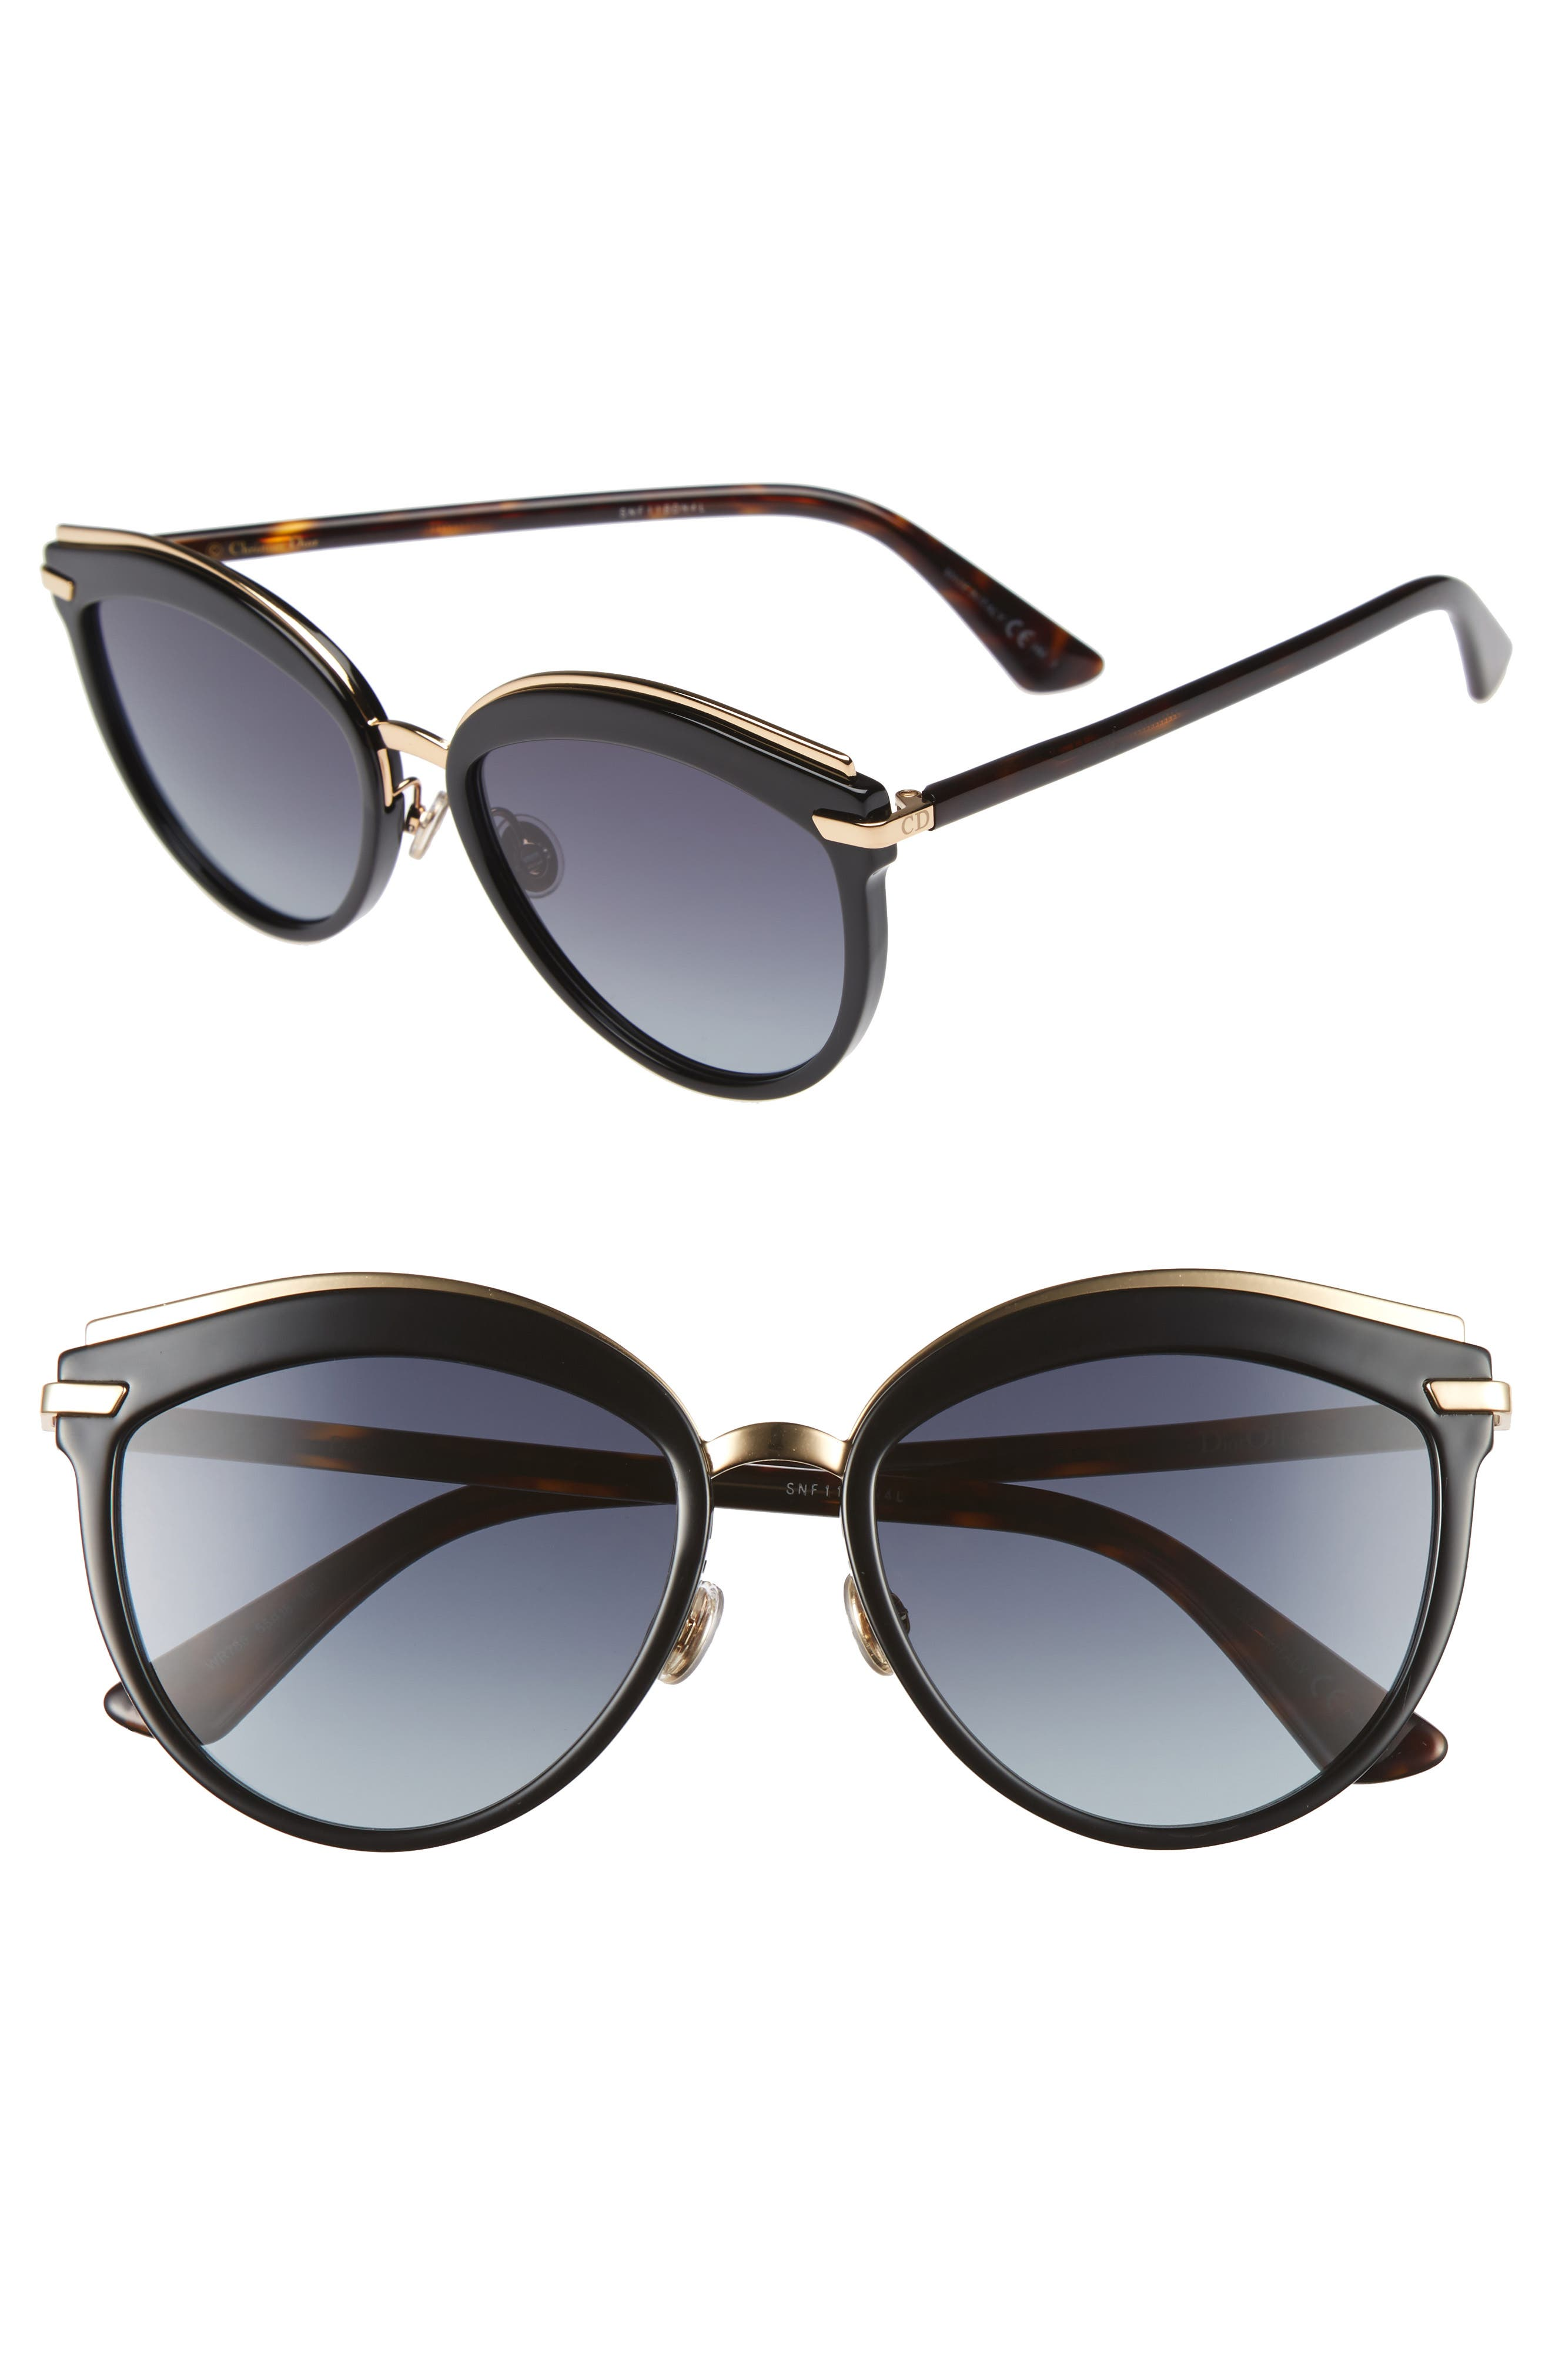 Offset 2 55mm Sunglasses,                         Main,                         color, 001